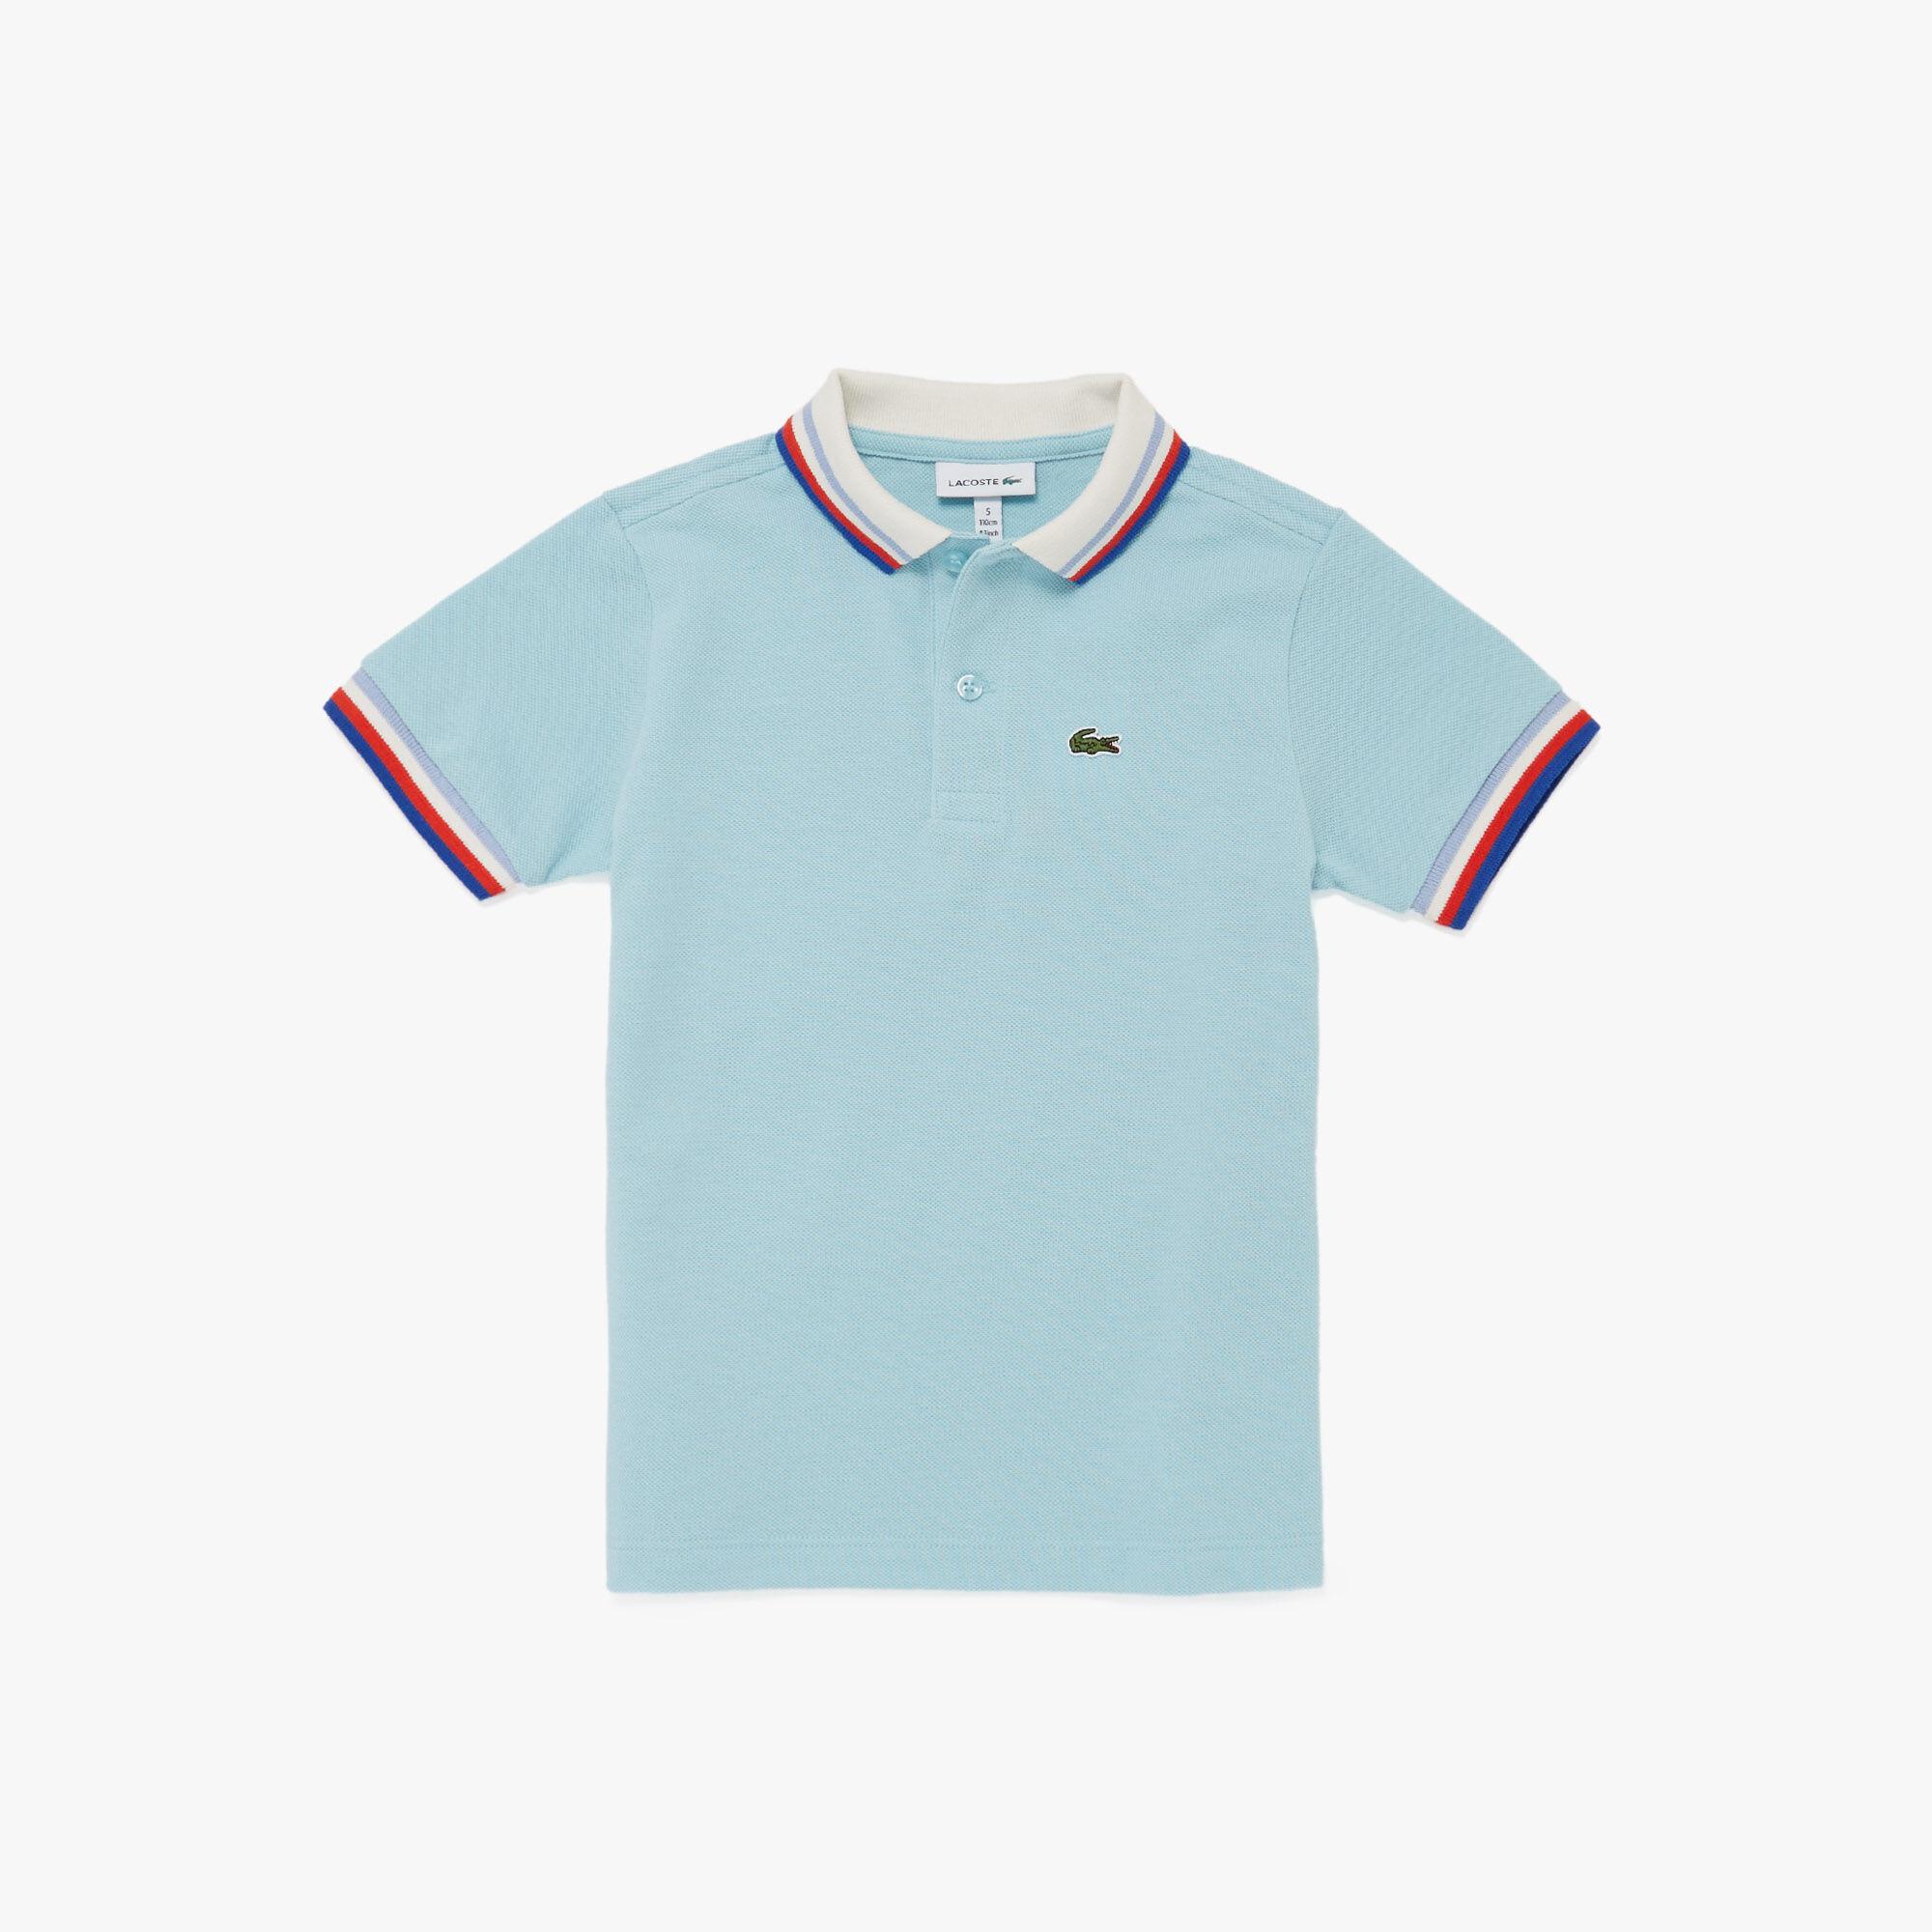 Boy's Lacoste Heritage Cotton Polo Shirt